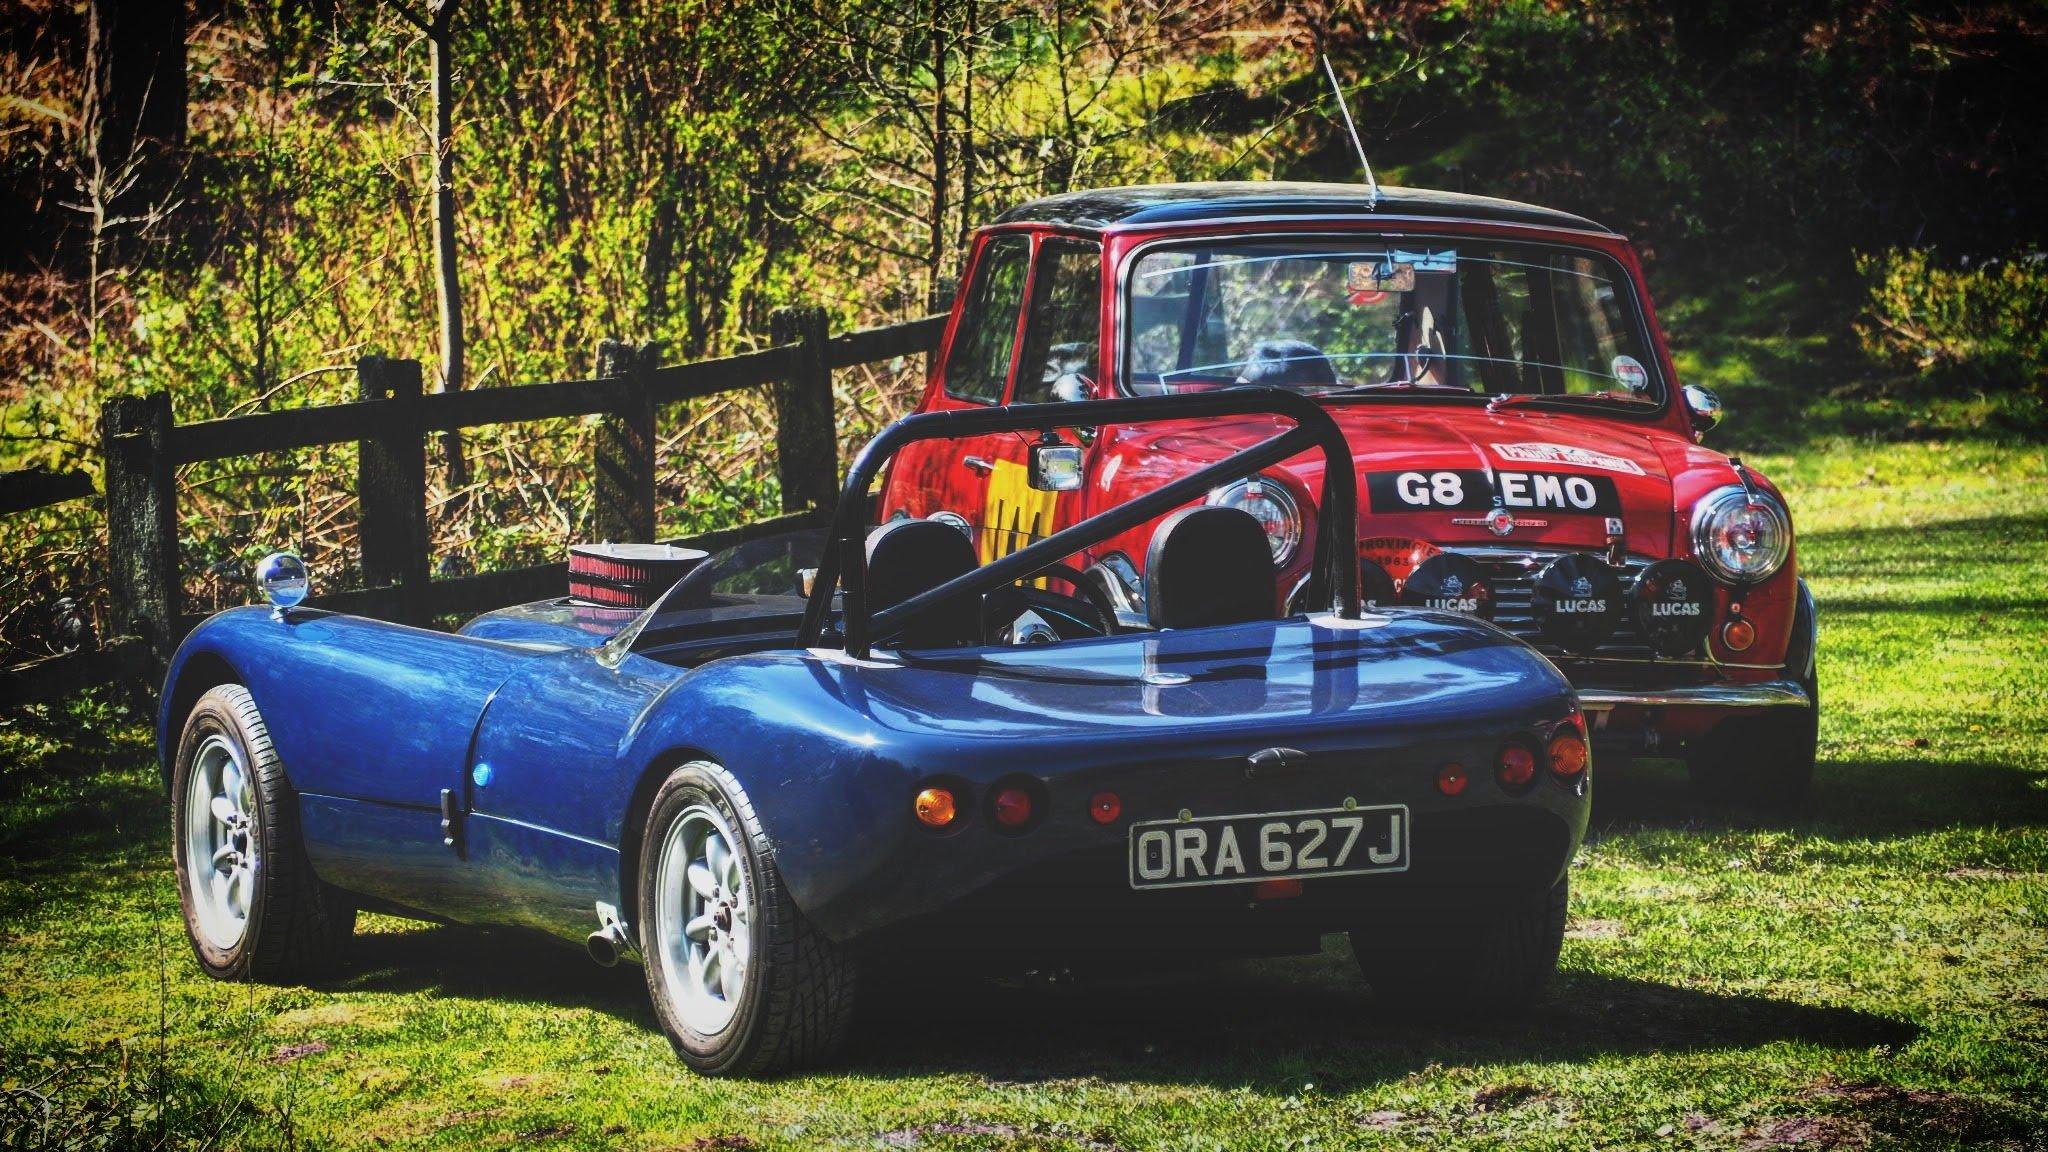 2001 Stuart taylor phoenix Track & Kit Car For Sale (picture 4 of 6)